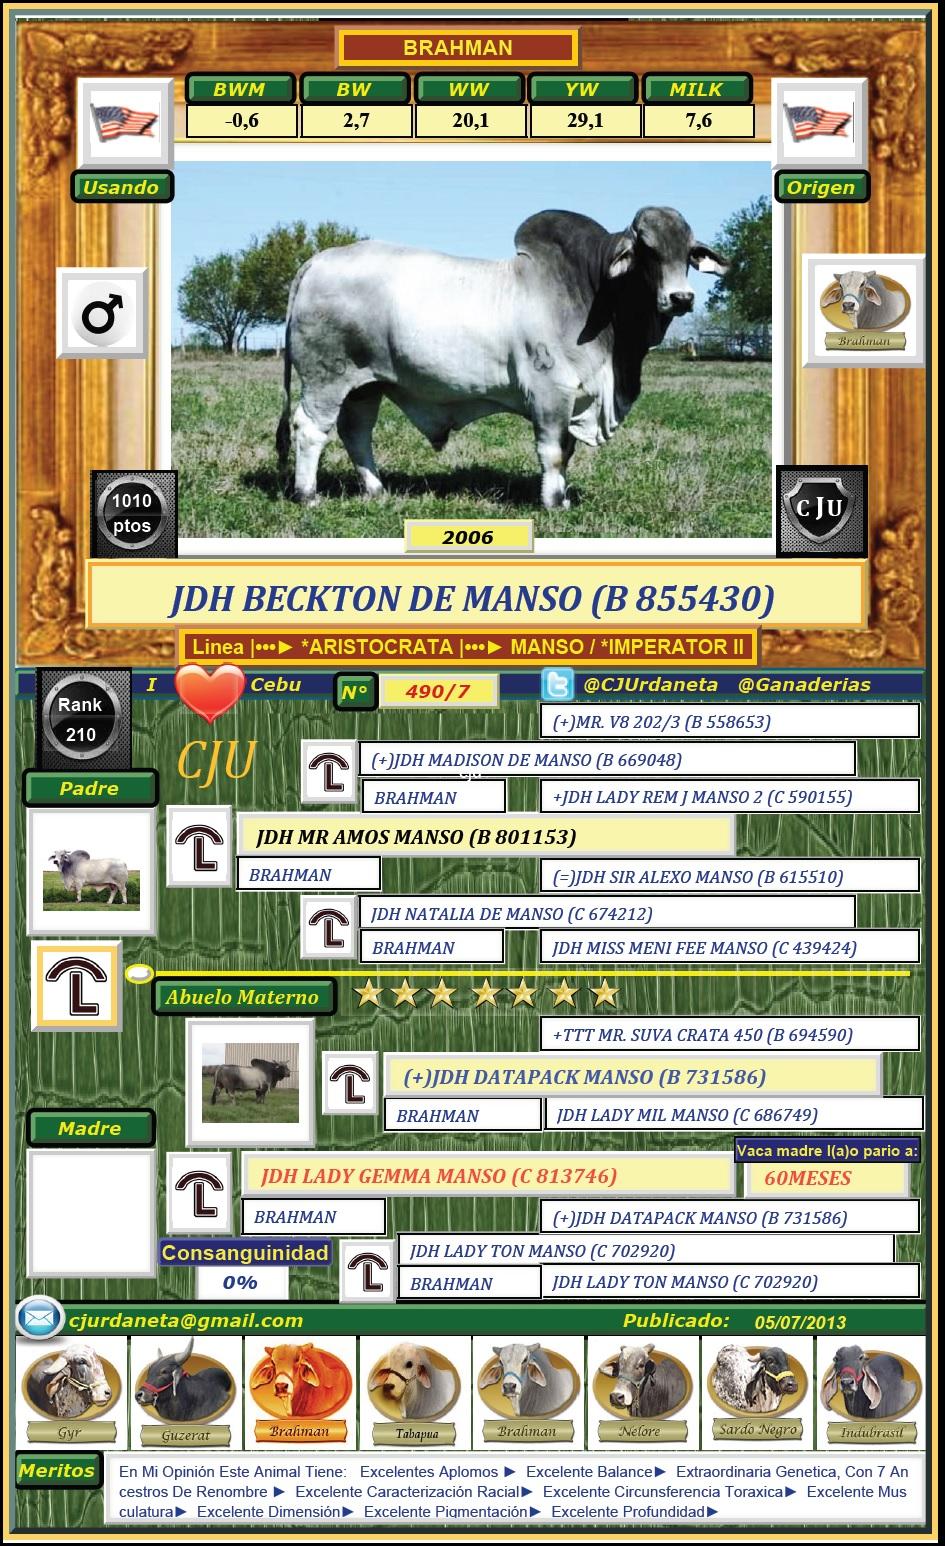 JDH BECKTON DE MANSO (B 855430)